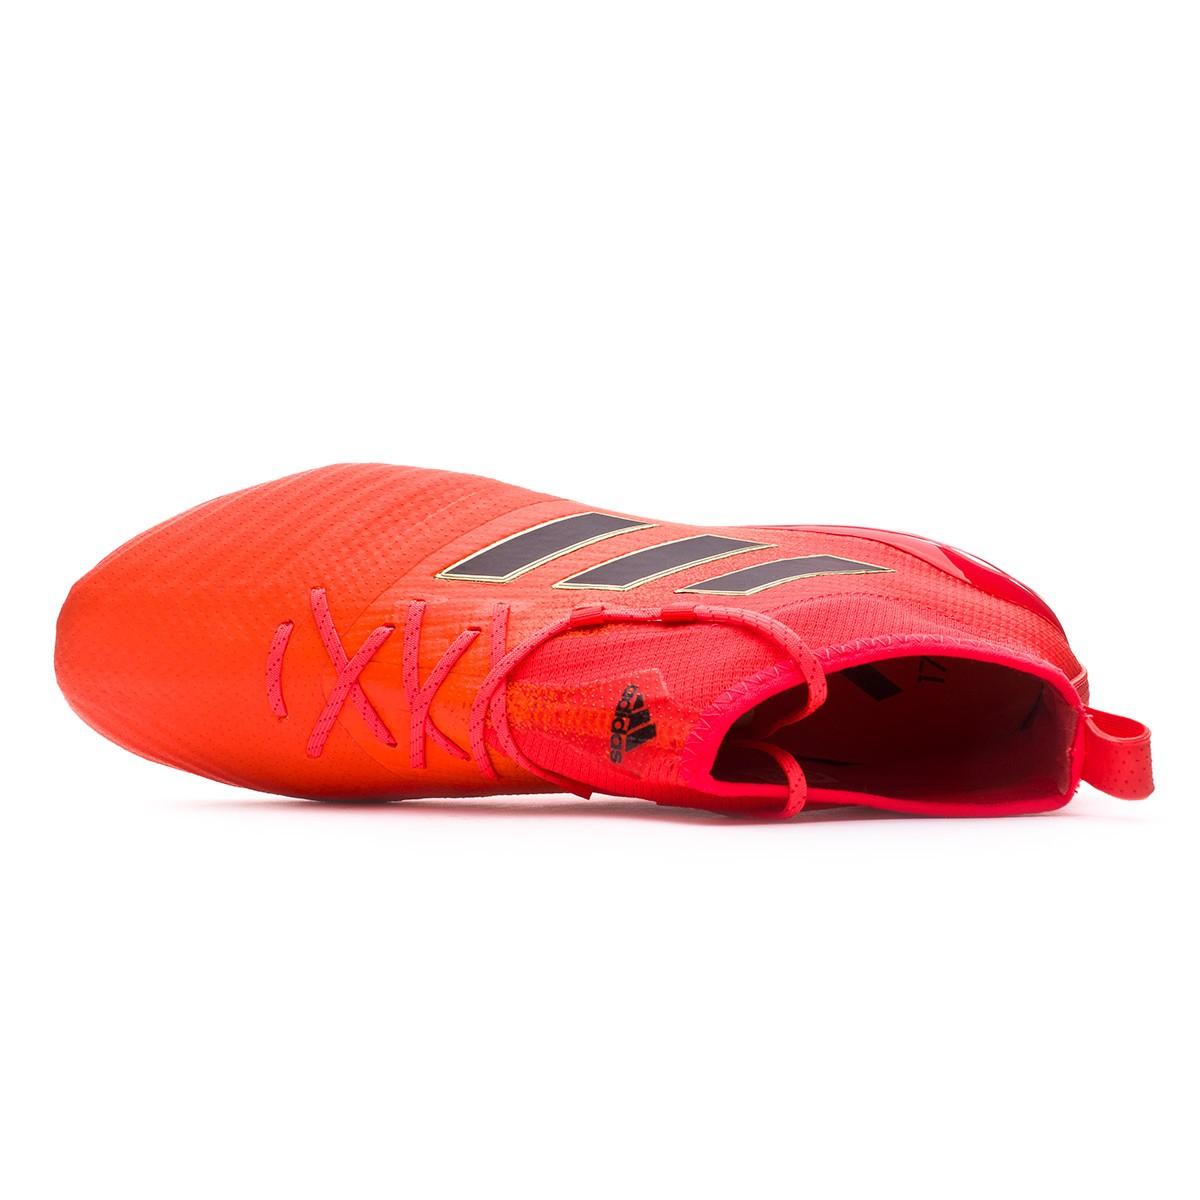 c6d76595775f Football Boots adidas Ace 17.1 Primeknit FG Solar orange-Core black-Solar  red - Football store Fútbol Emotion